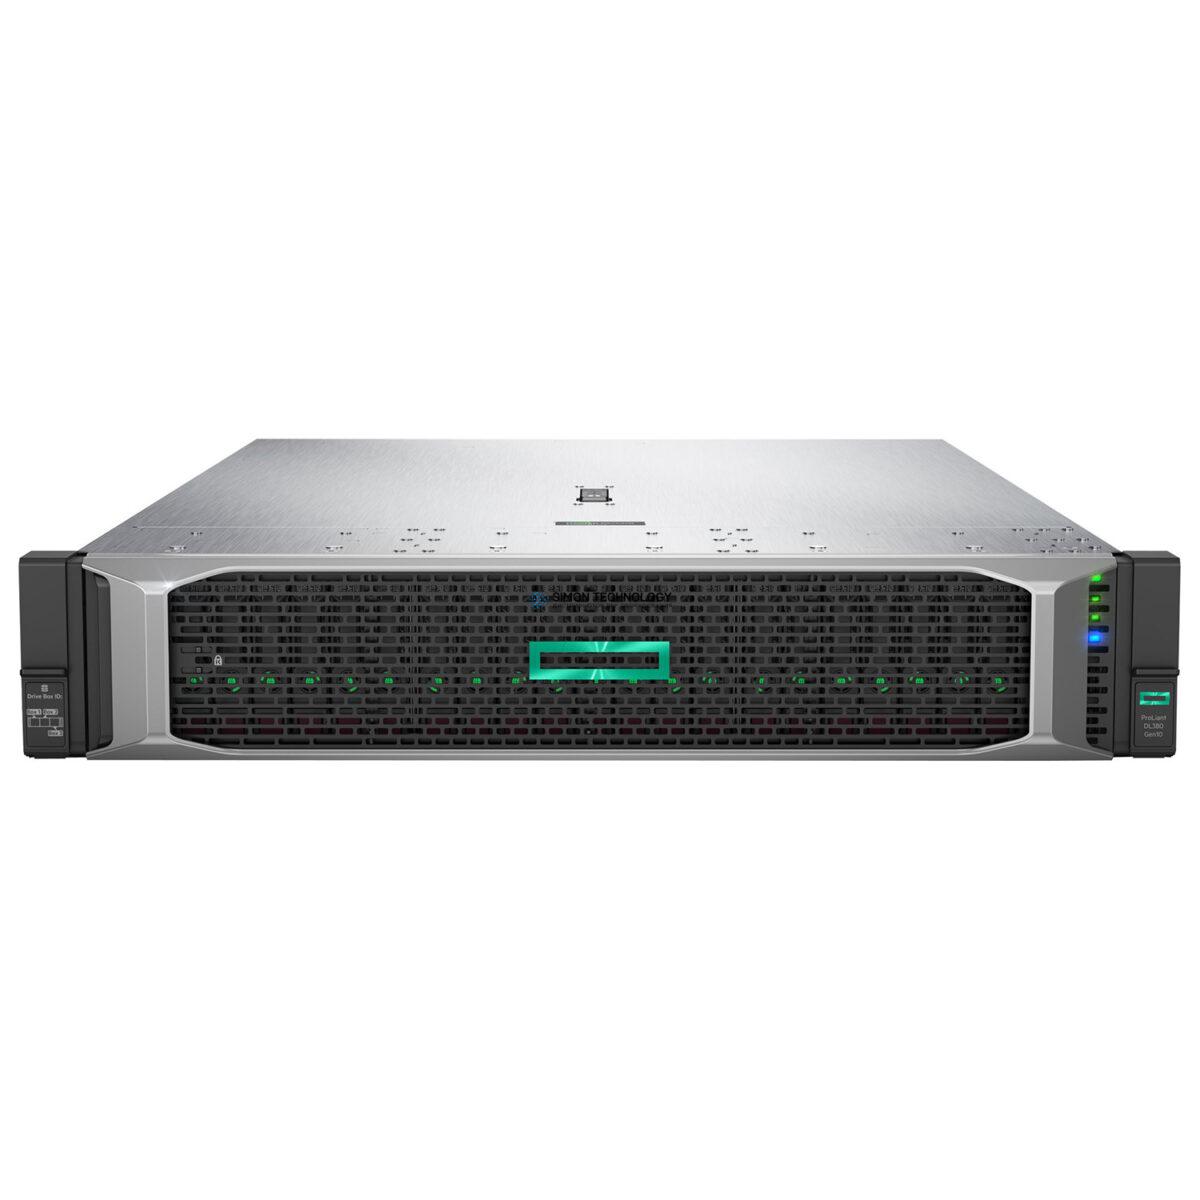 "Сервер HPE Enterprise - ProLiant DL380 Gen10 SMB - Server - Rack-Montage - 2U - zweiweg - 1 x Xeon Silver 4208 / 2.1 GHz - RAM 16 GB - SATA/SAS - Hot-Swap 6.4 cm (2.5"") (P02462-B21)"